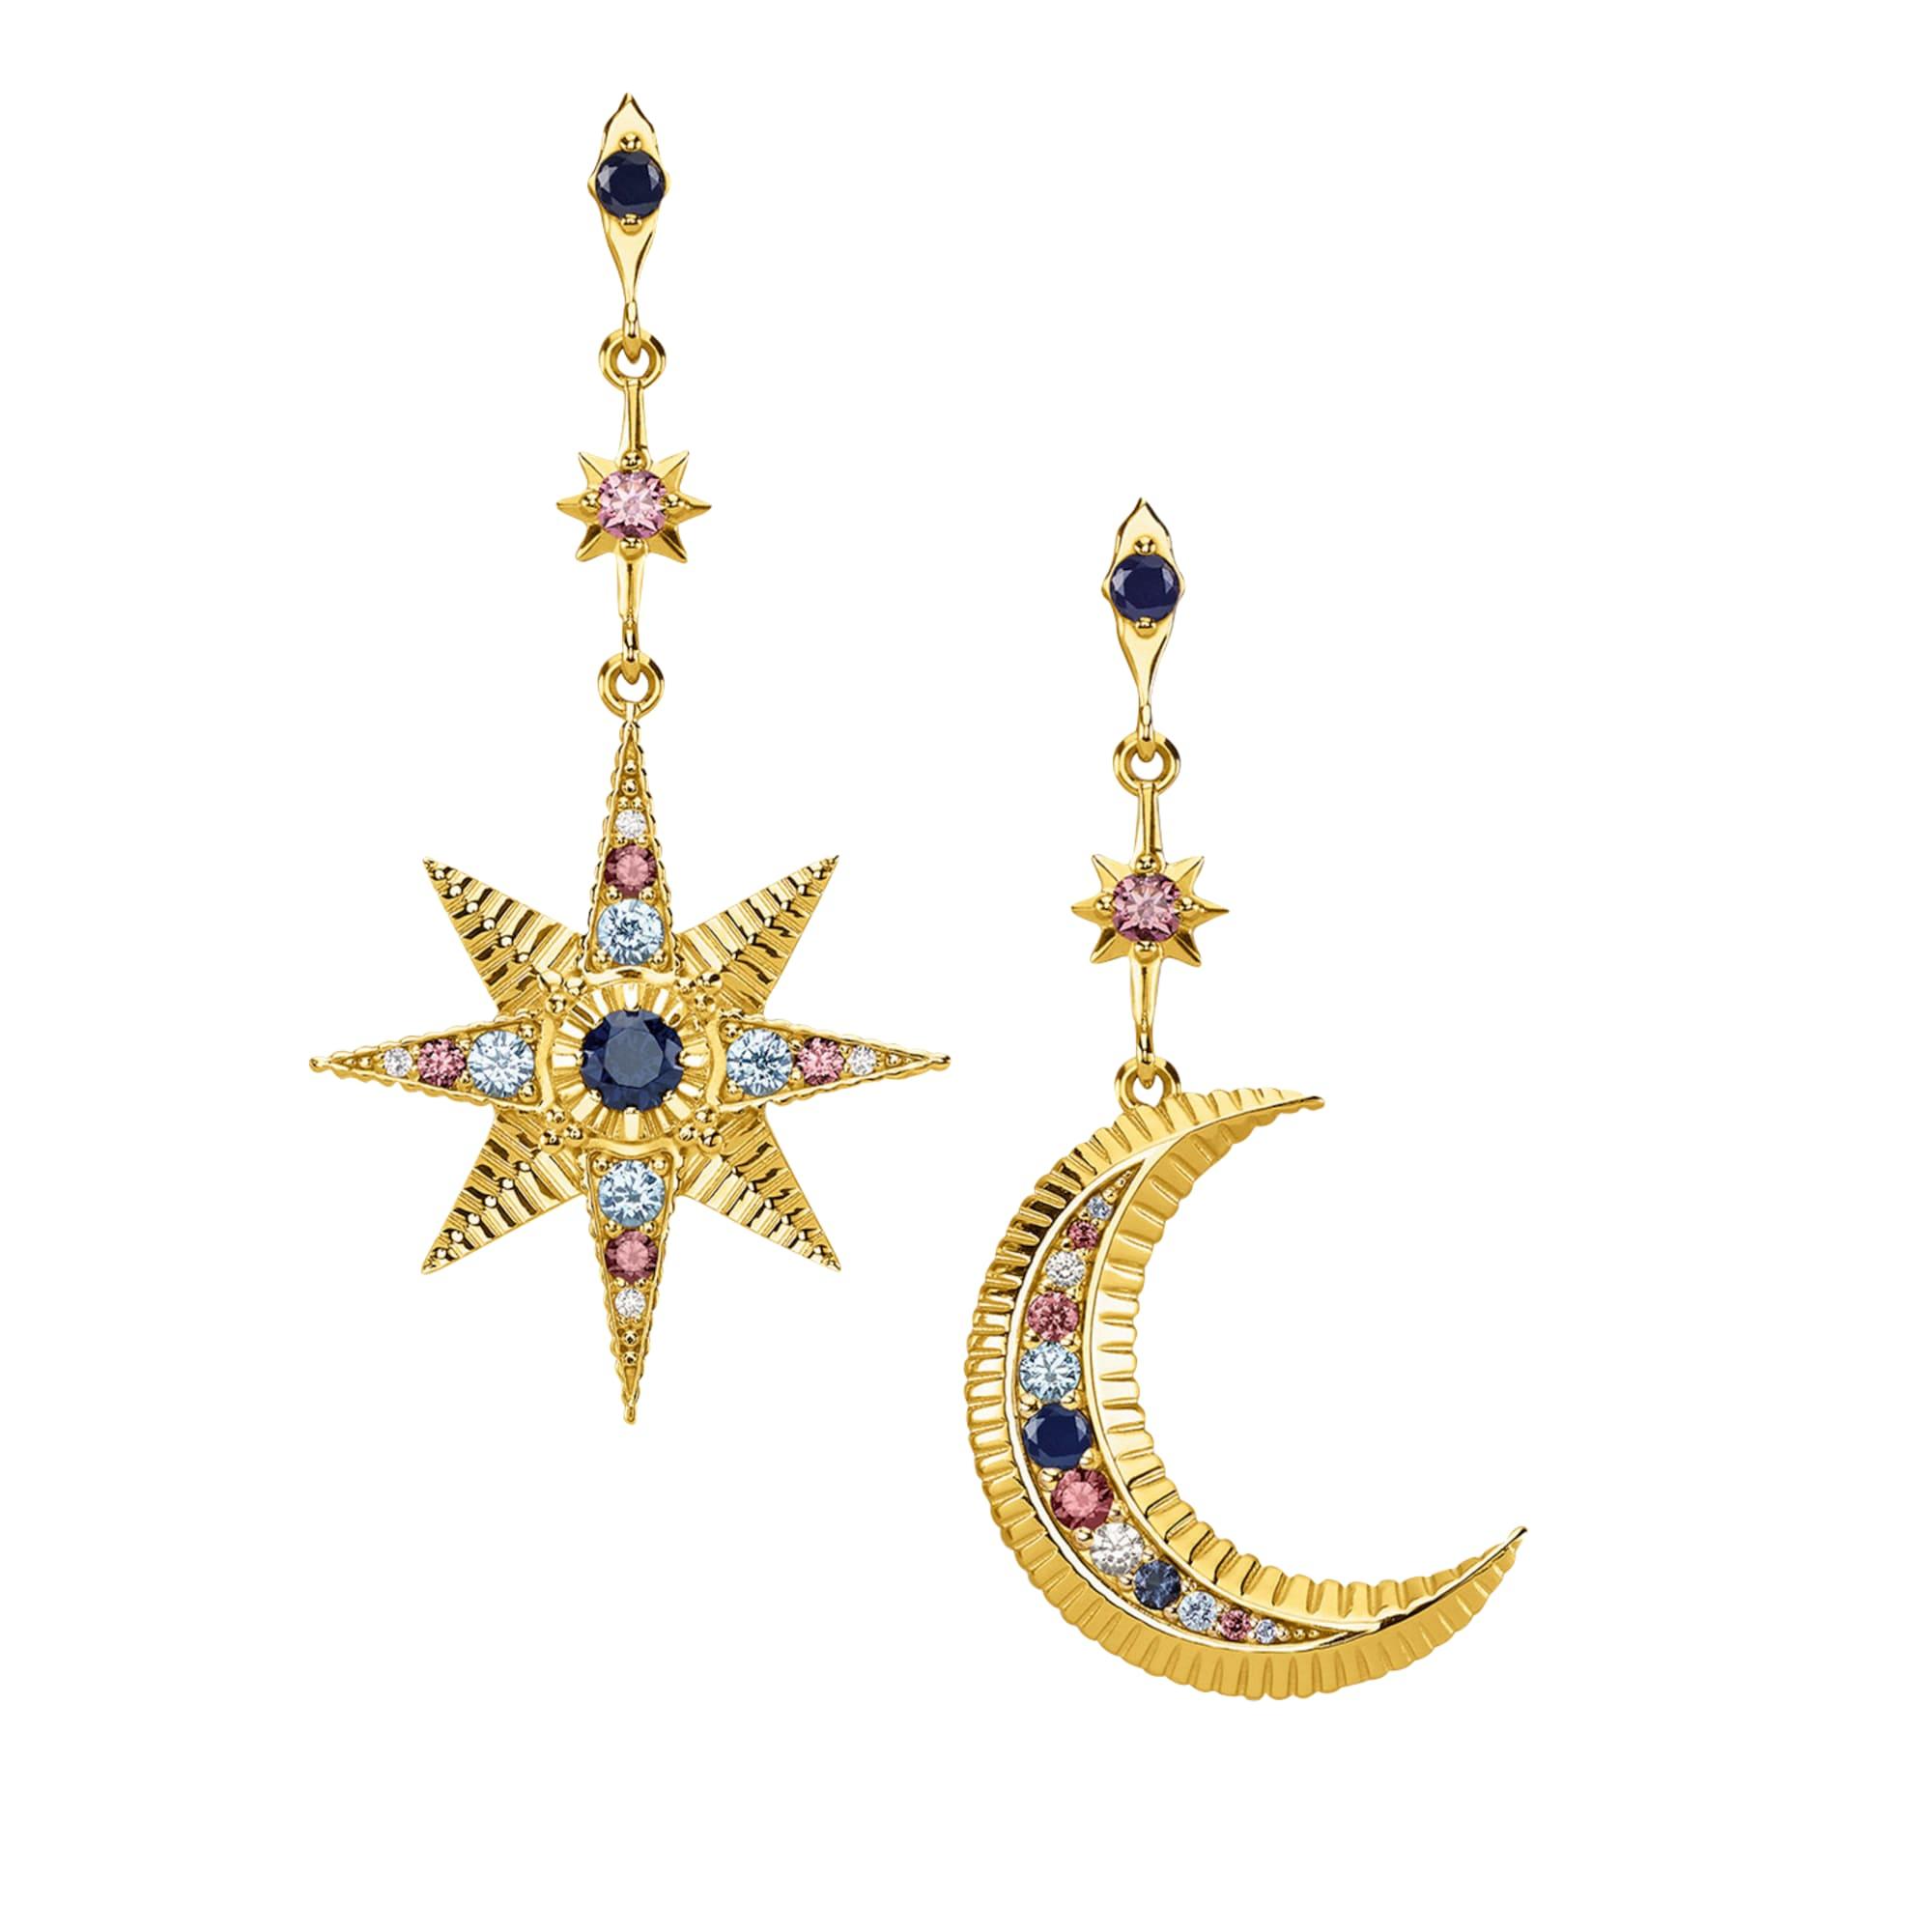 Náušnice Royalty Stern & Mond modrá zlatá růžová bílá Thomas Sabo